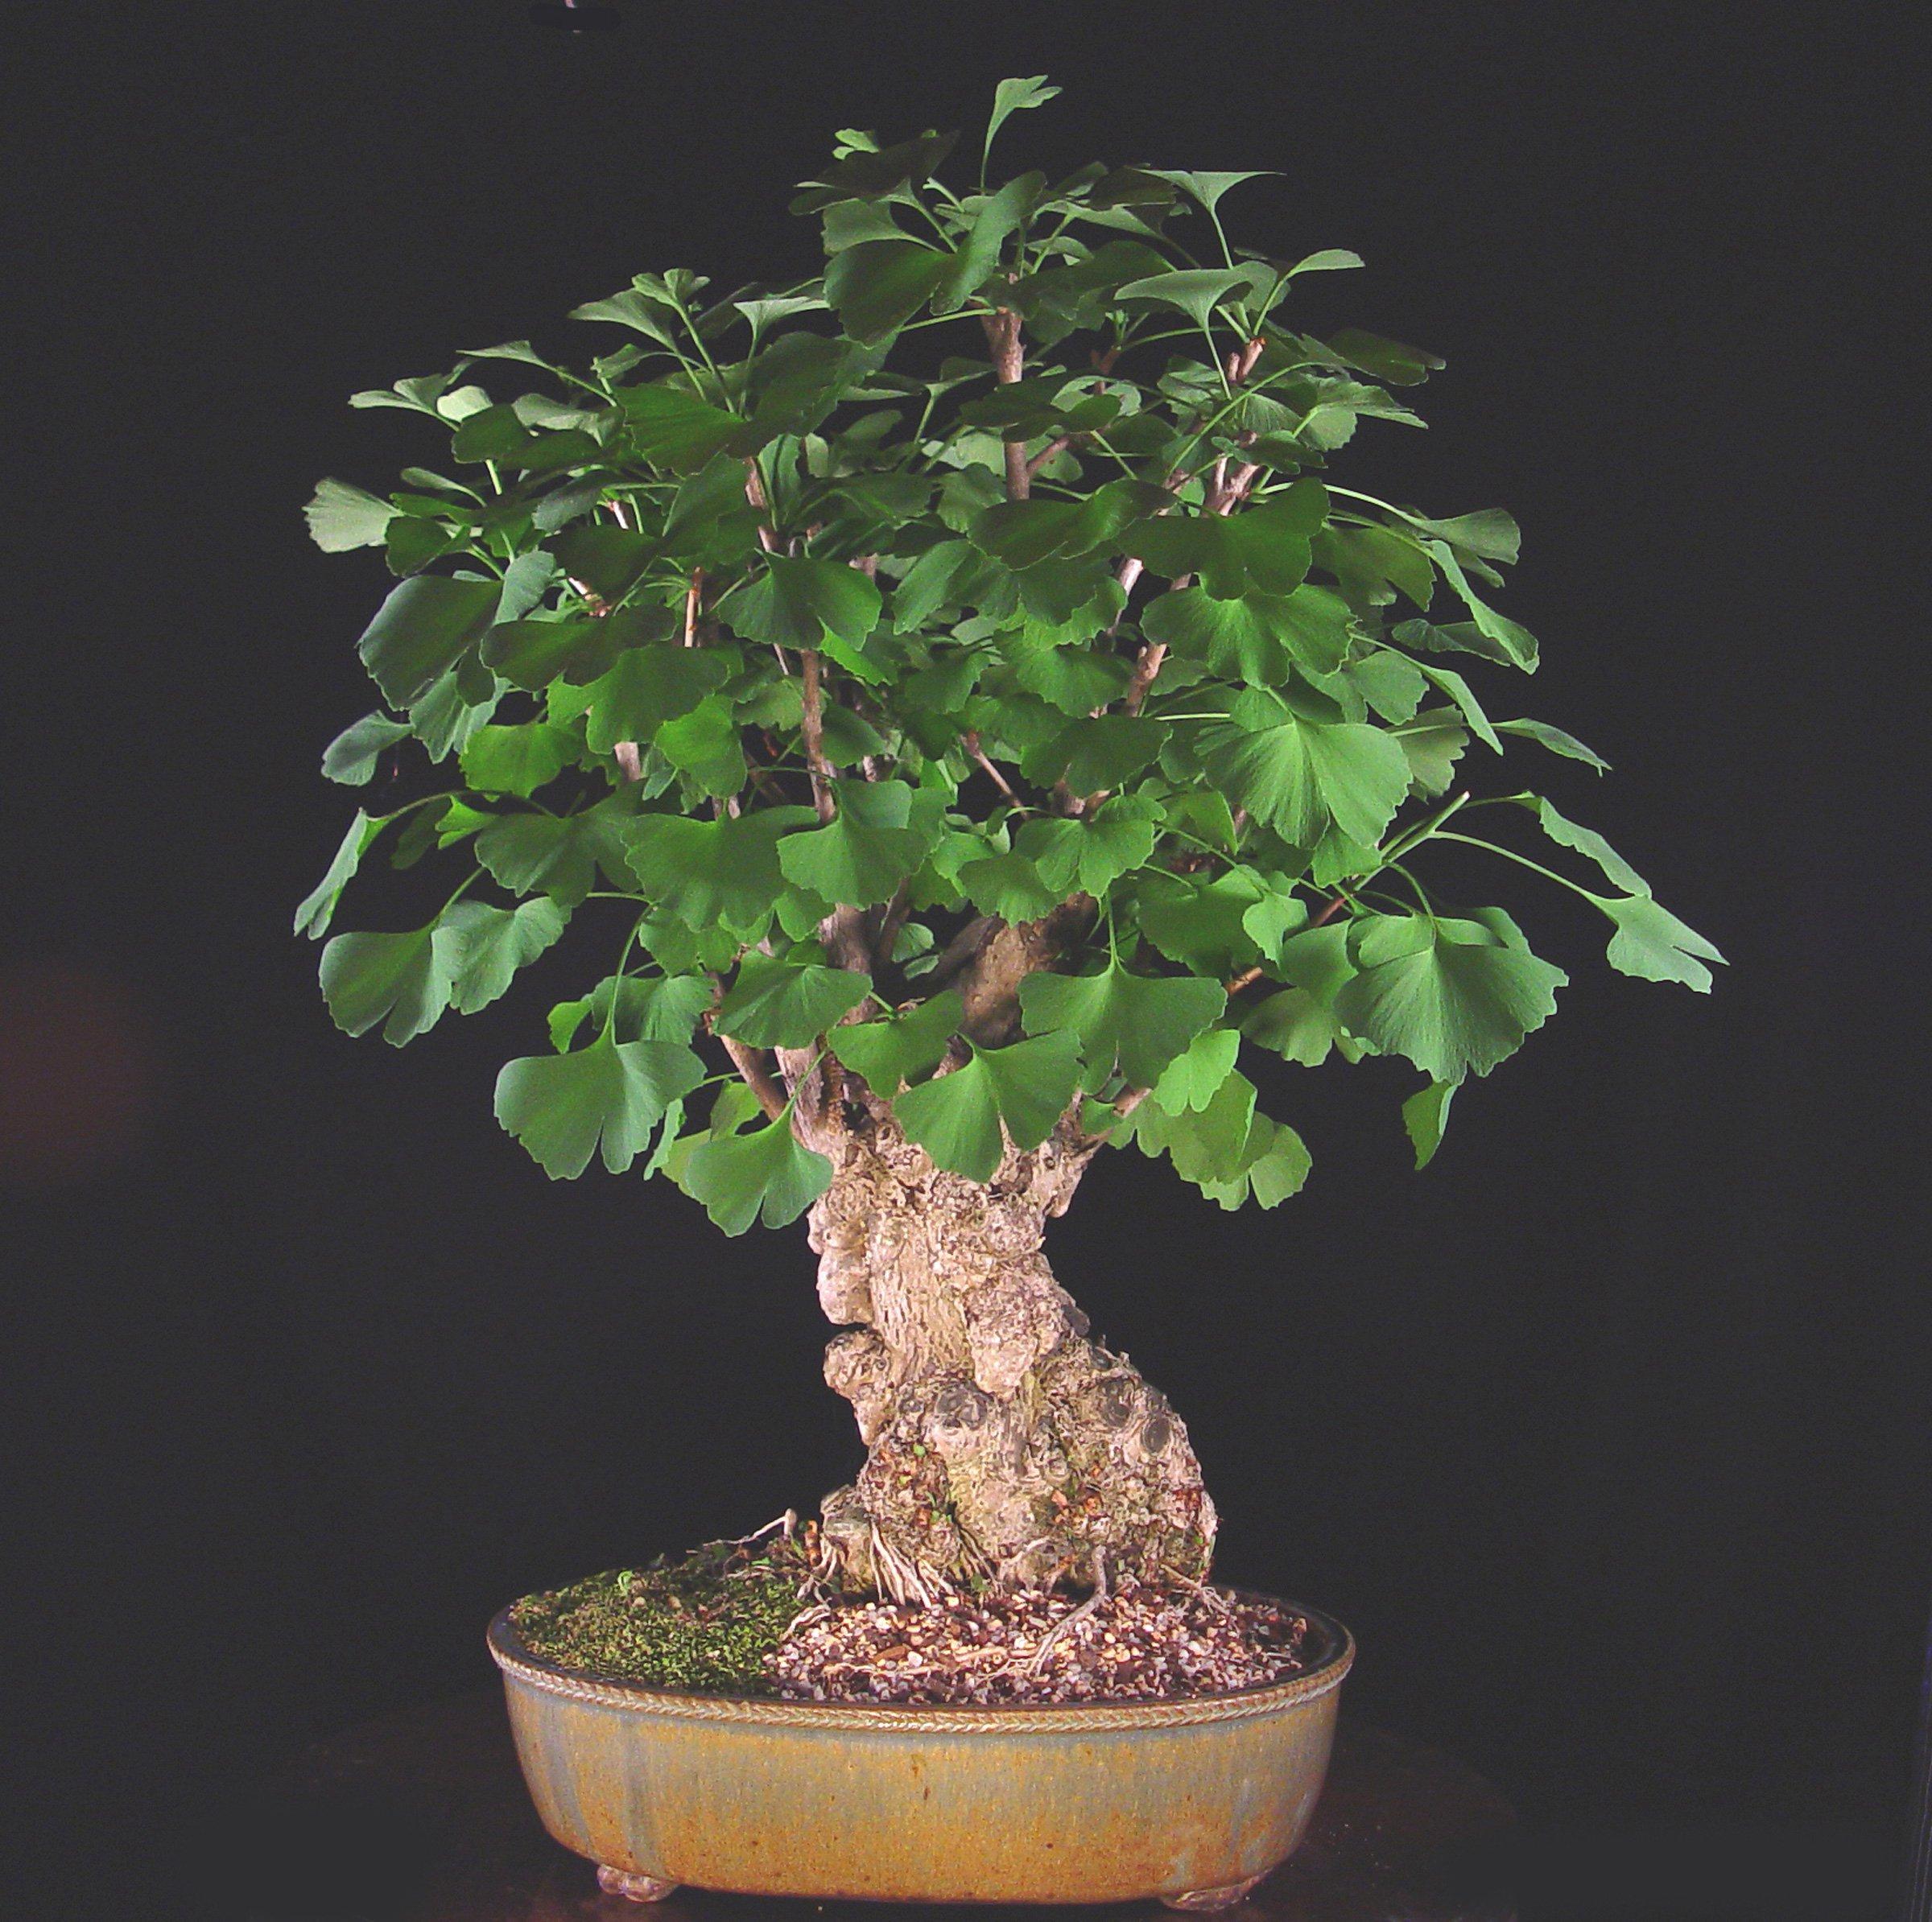 ginkgo biloba care rh bonsaioutlet com Bonsai Copper Wire Bonsai Wire Sizes